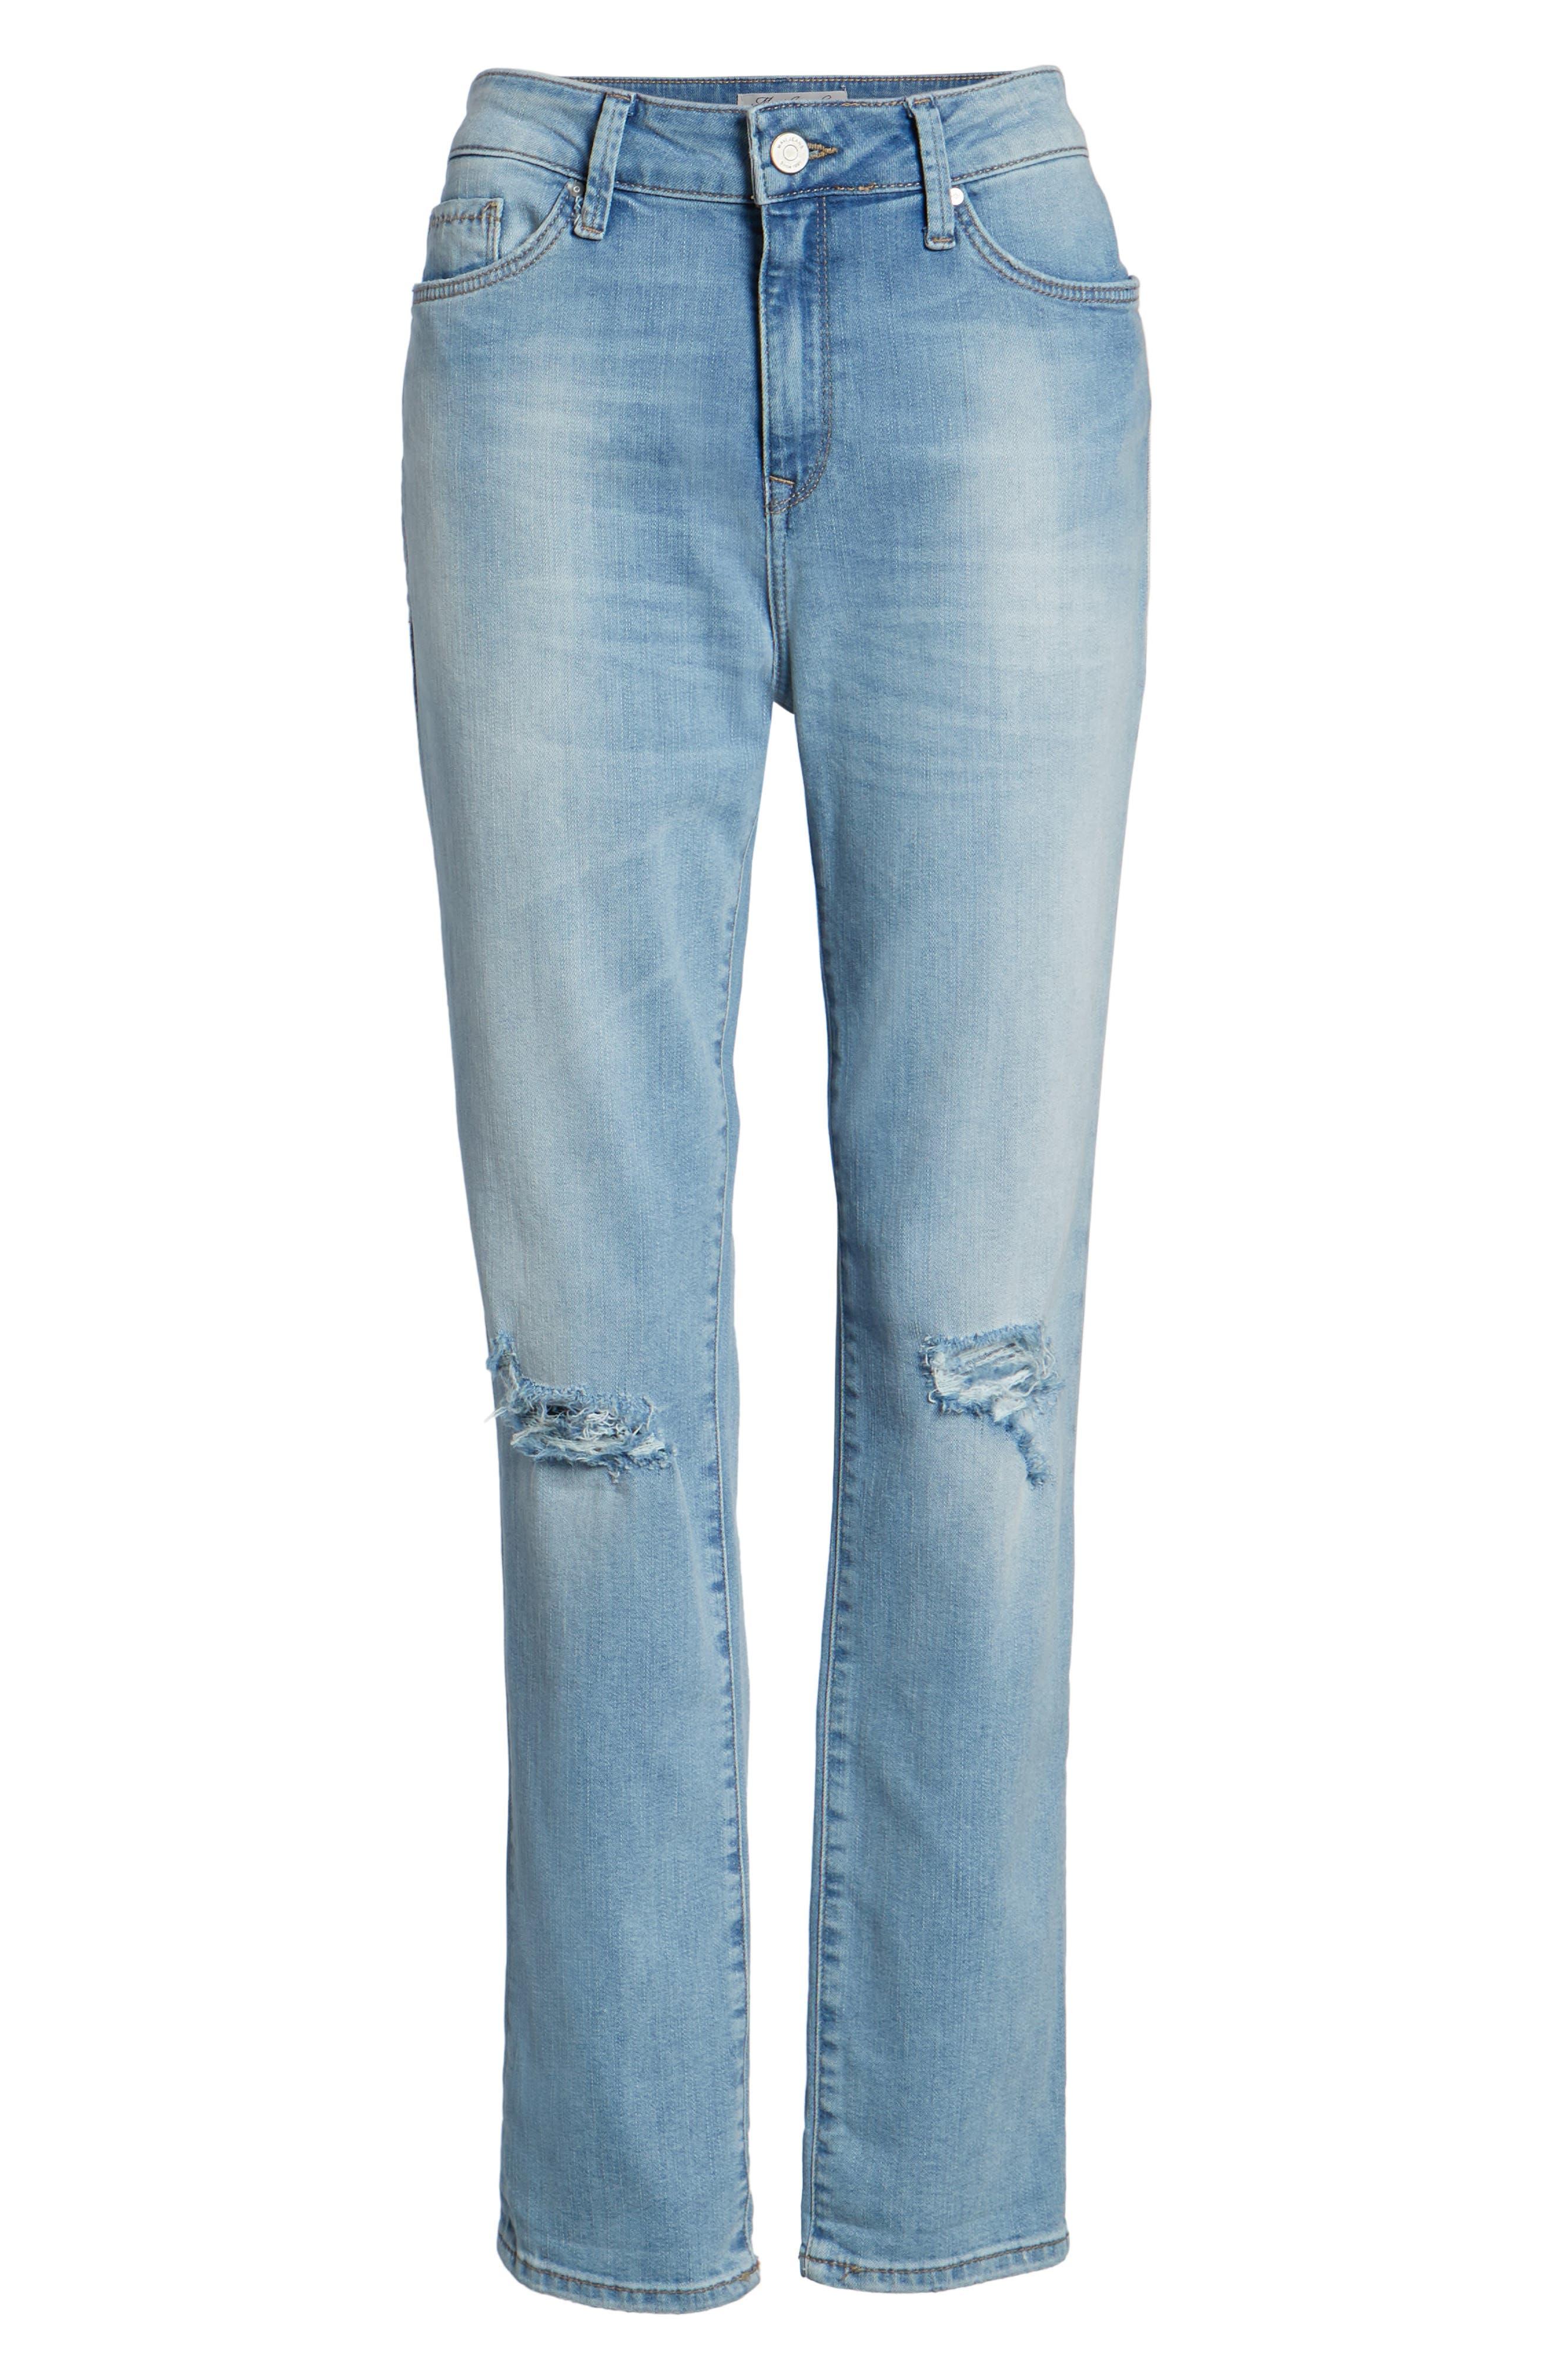 Lea Boyfriend Ripped Jeans,                             Alternate thumbnail 7, color,                             420